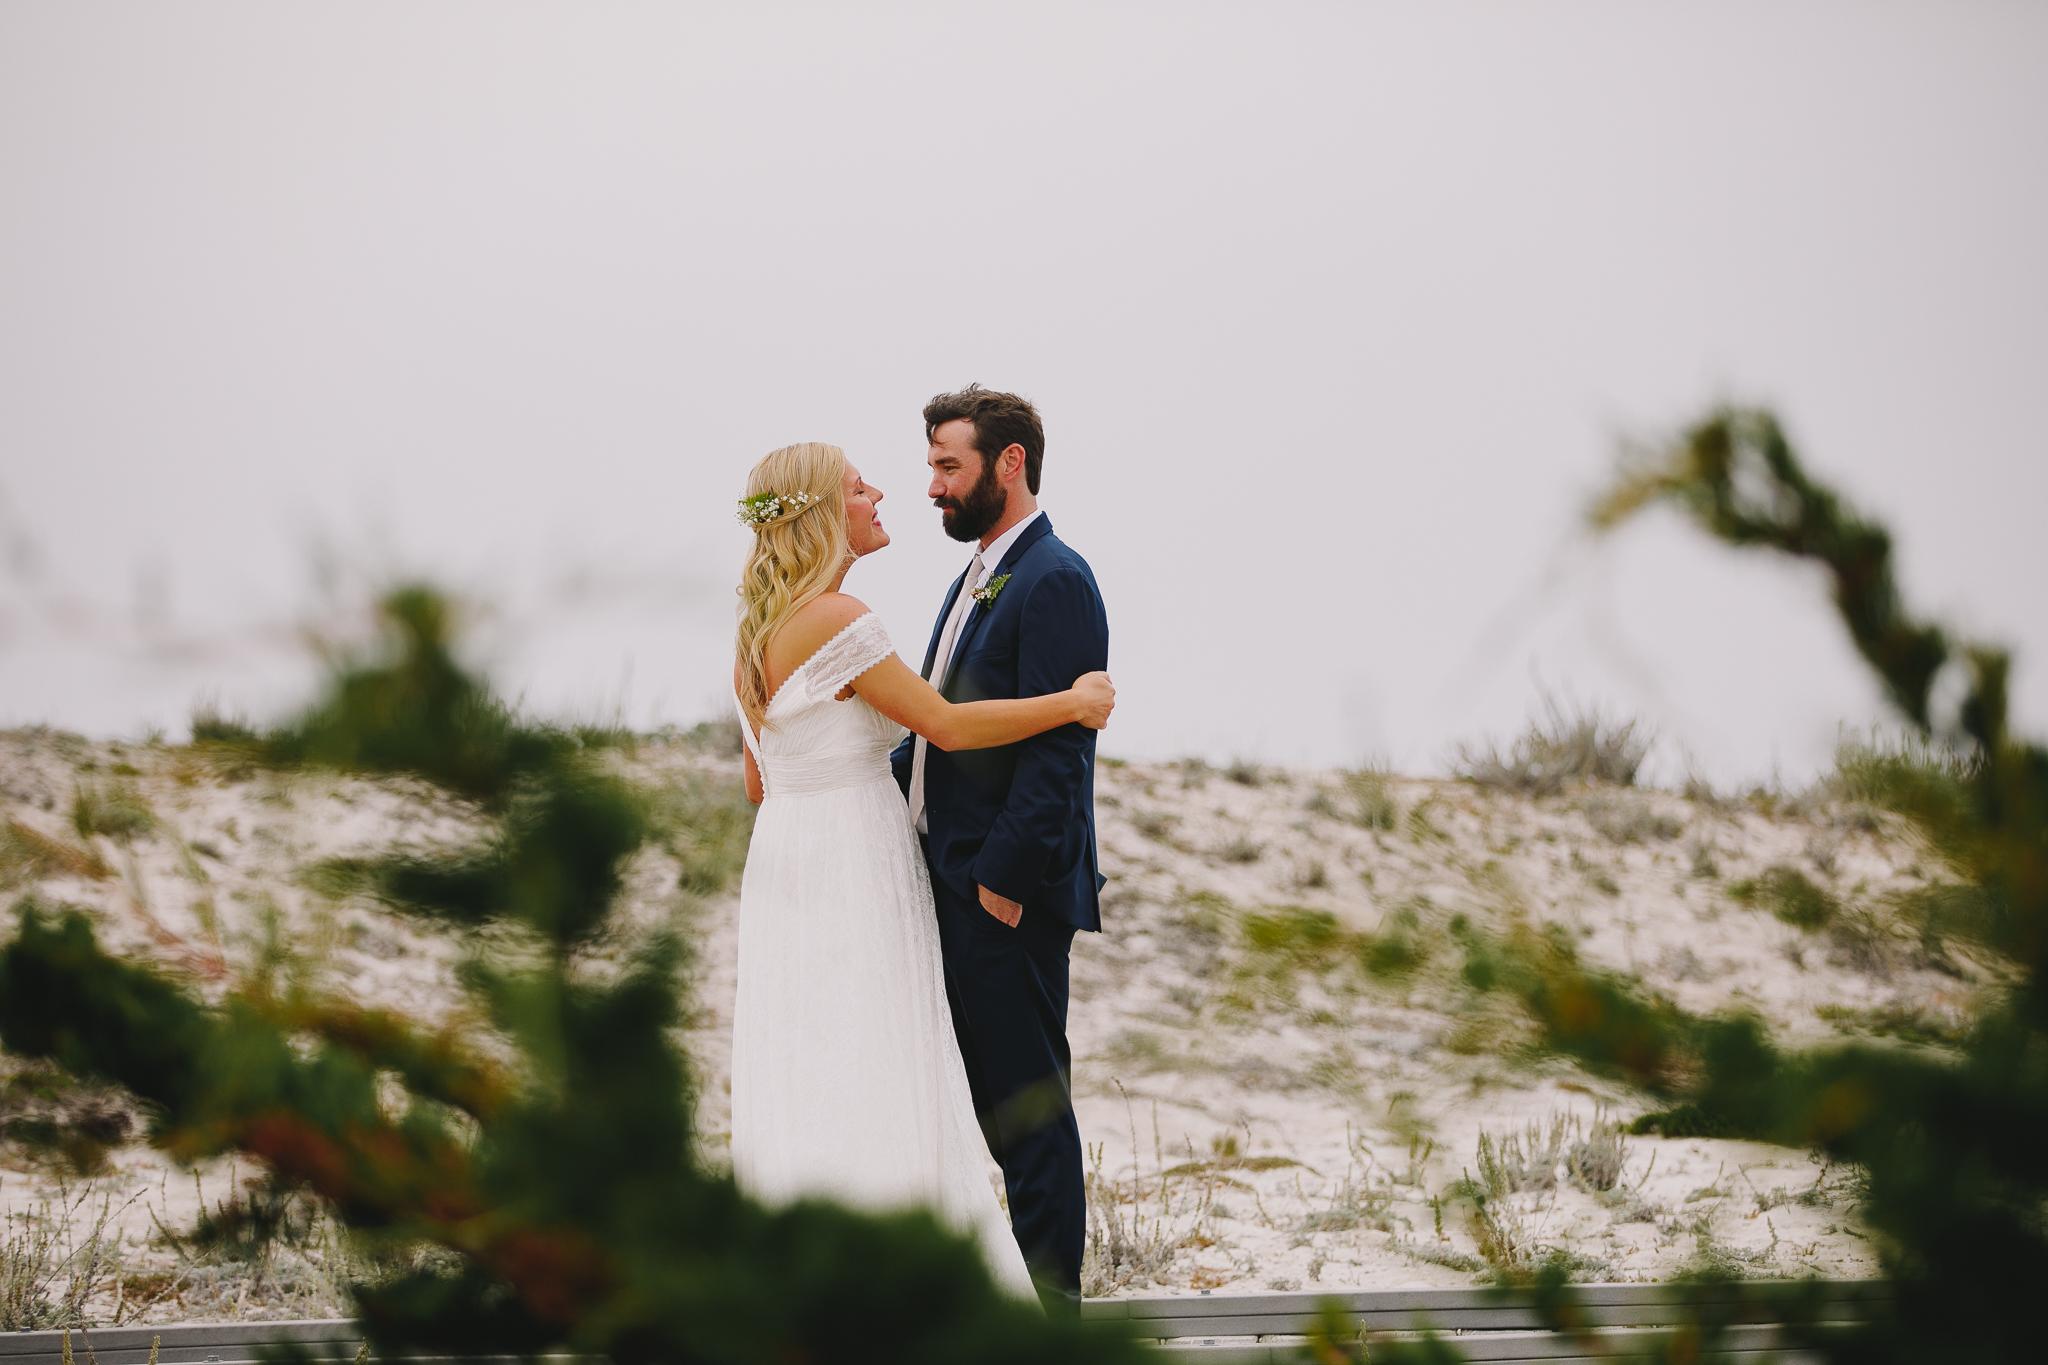 Archer_Inspired_Photography_Pacific_Grove_Ansilomar_Beach_Carmel_Valley_Wedding-39.jpg